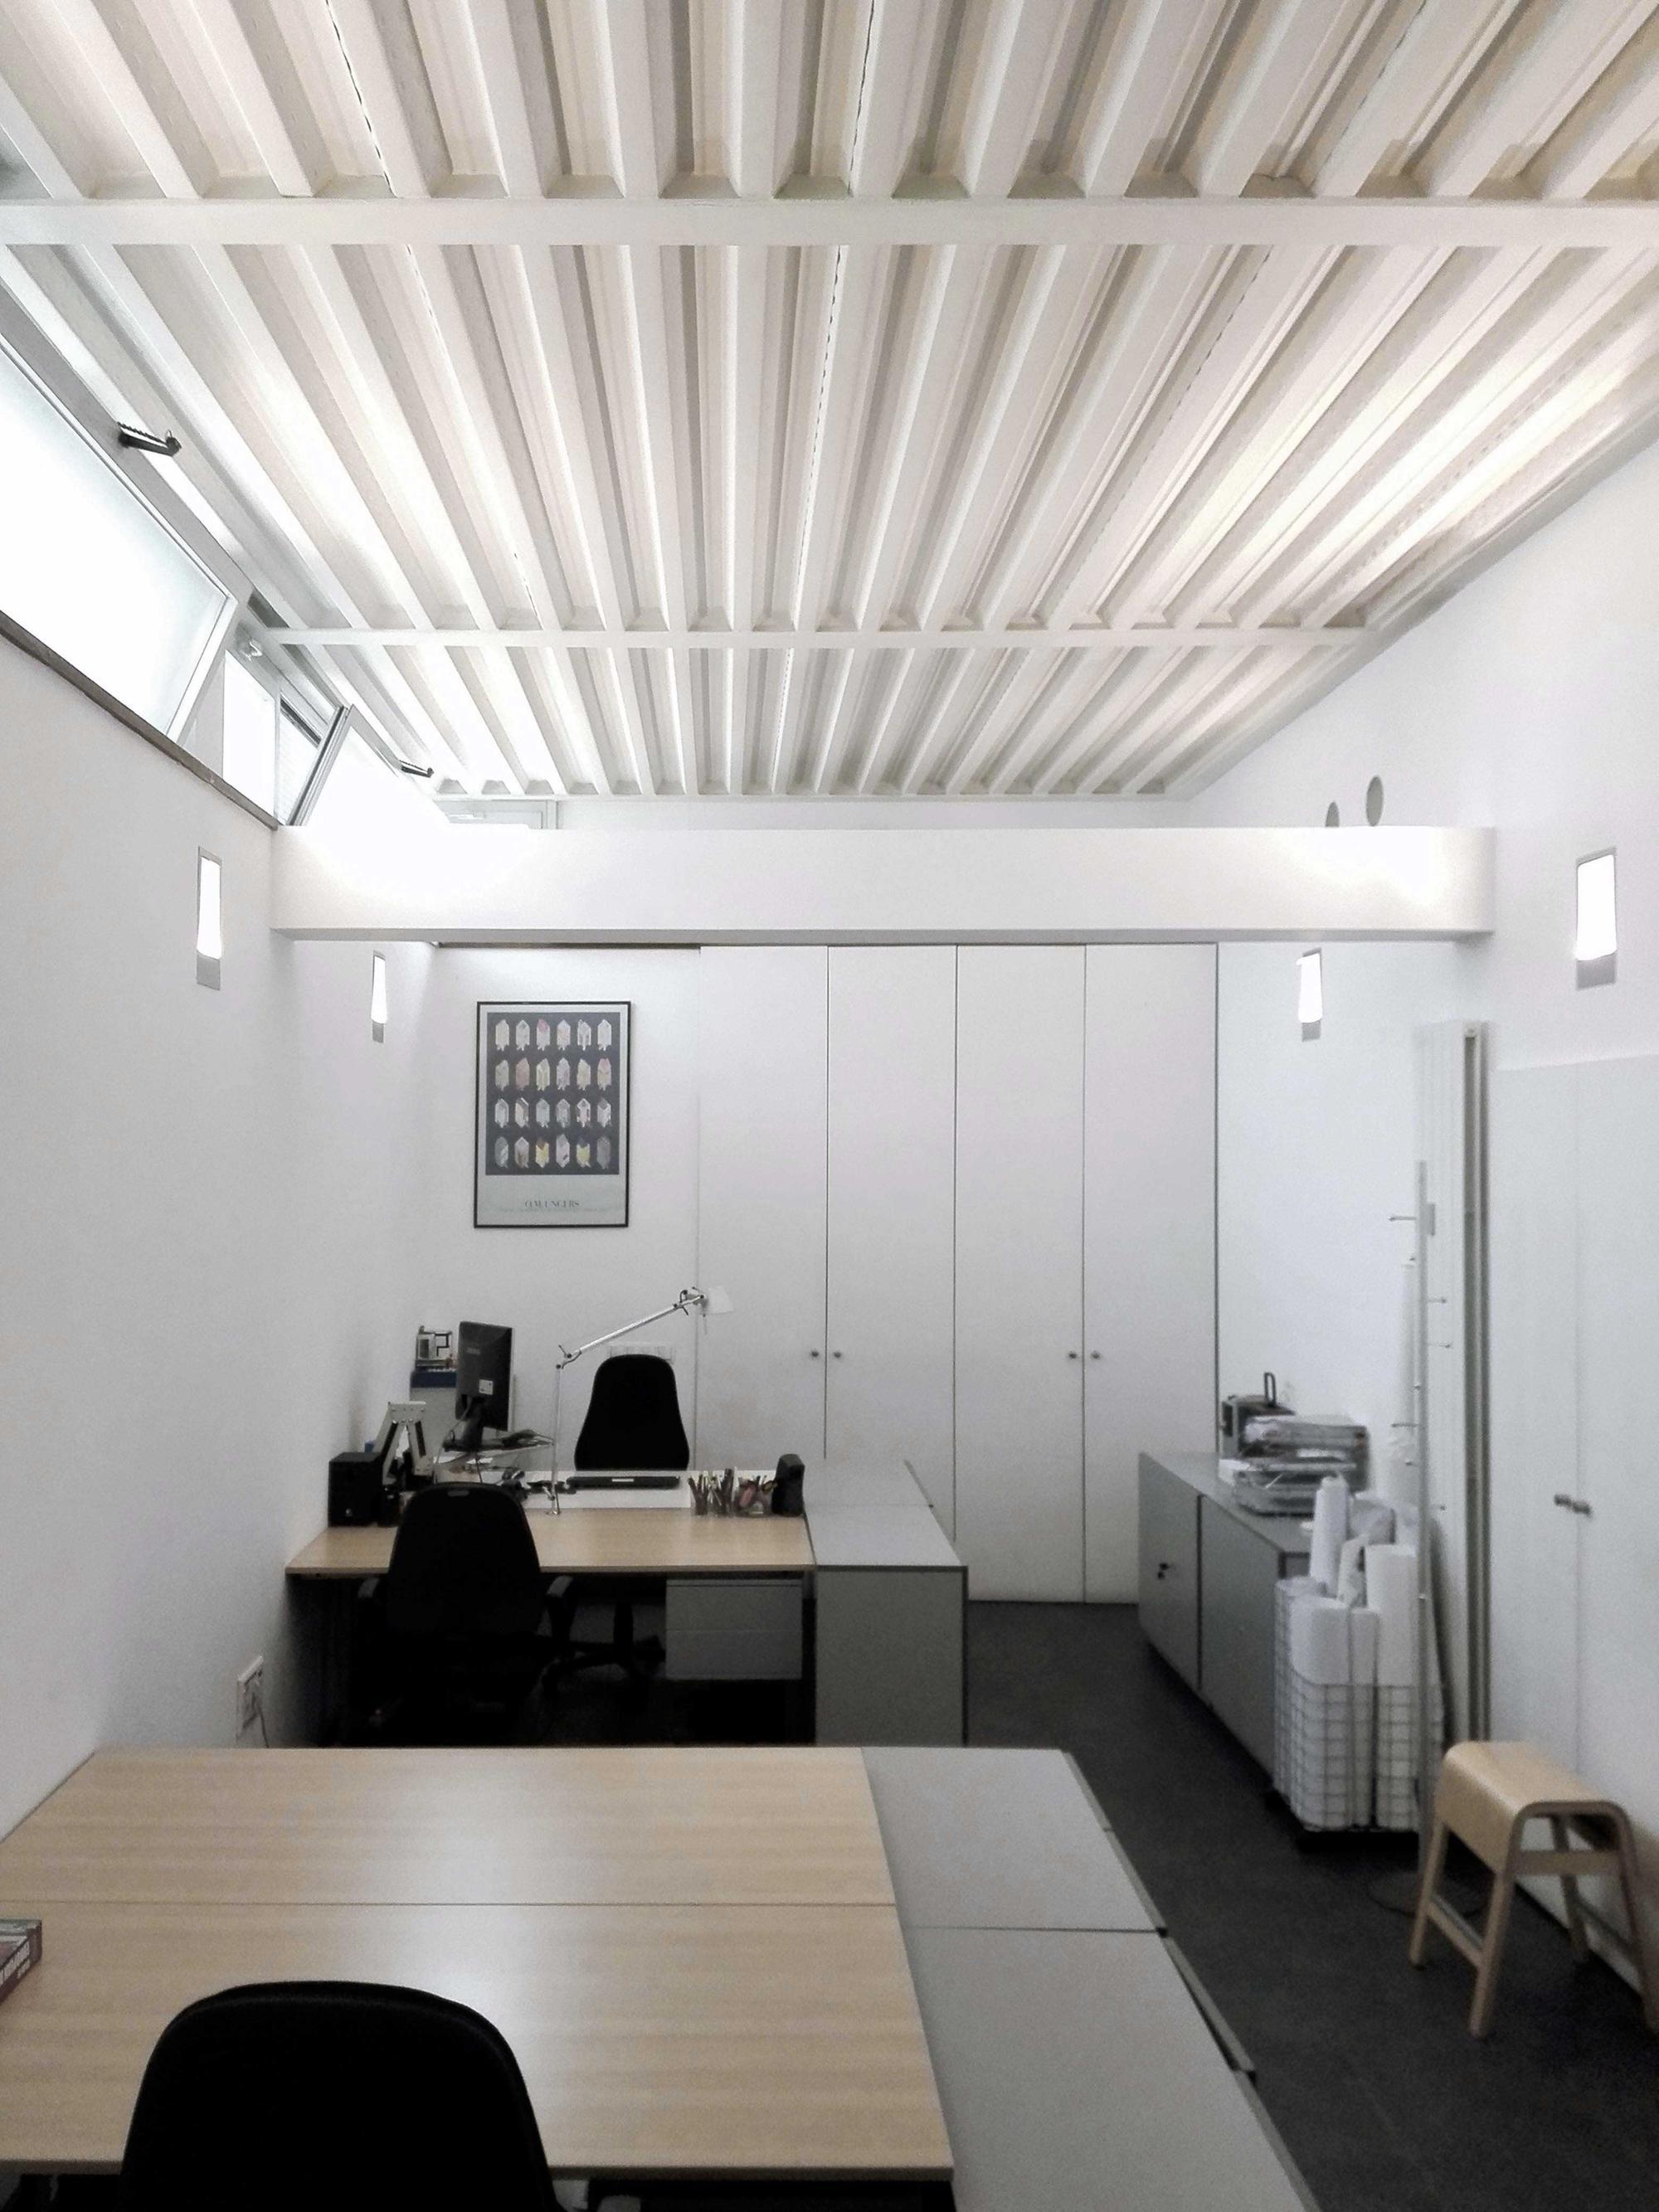 Alberich rodr guez arquitectos - Estudios de arquitectura coruna ...